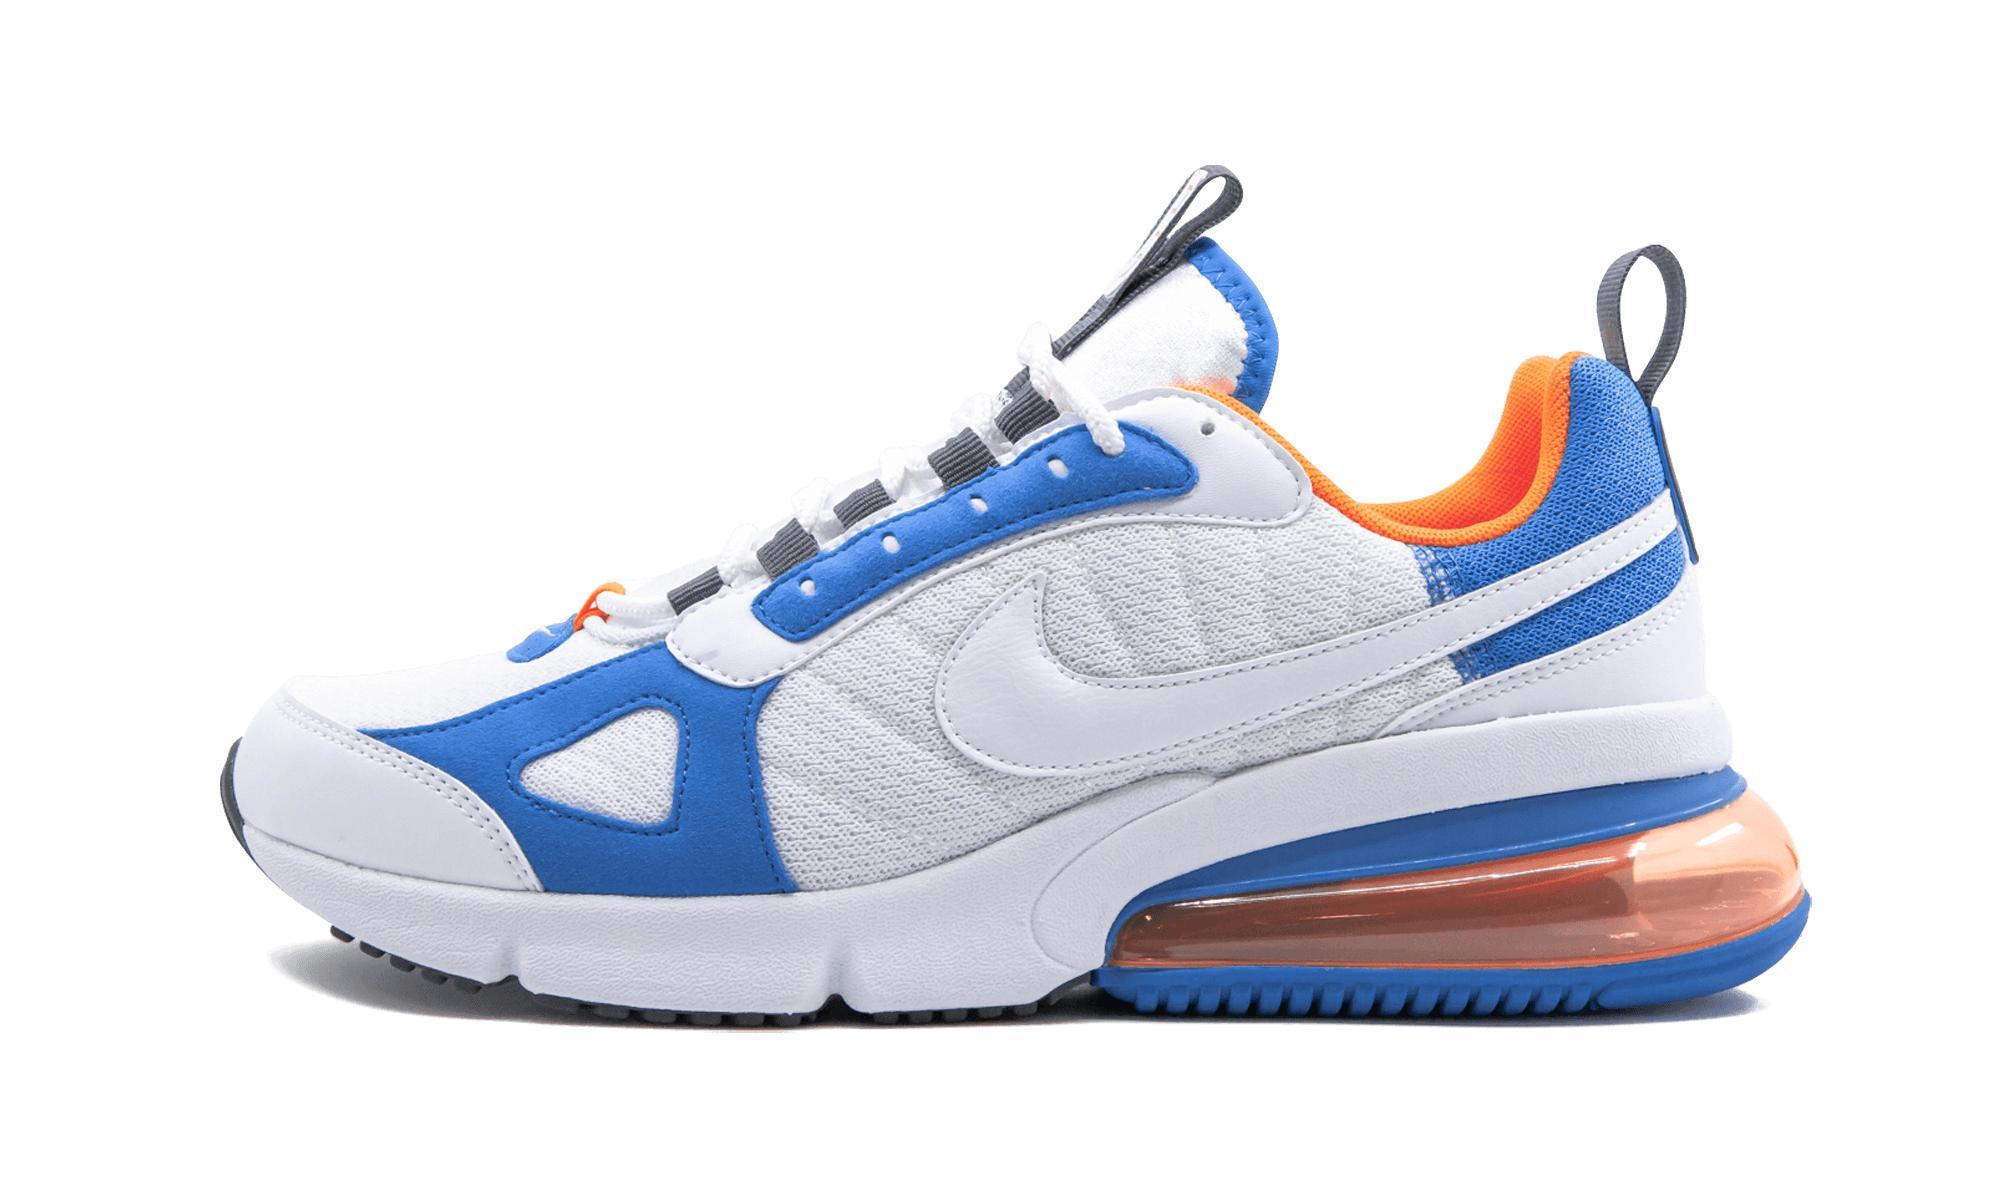 7f45d44a9d3 Nike Air Max 270 Futura in Blue for Men - Lyst